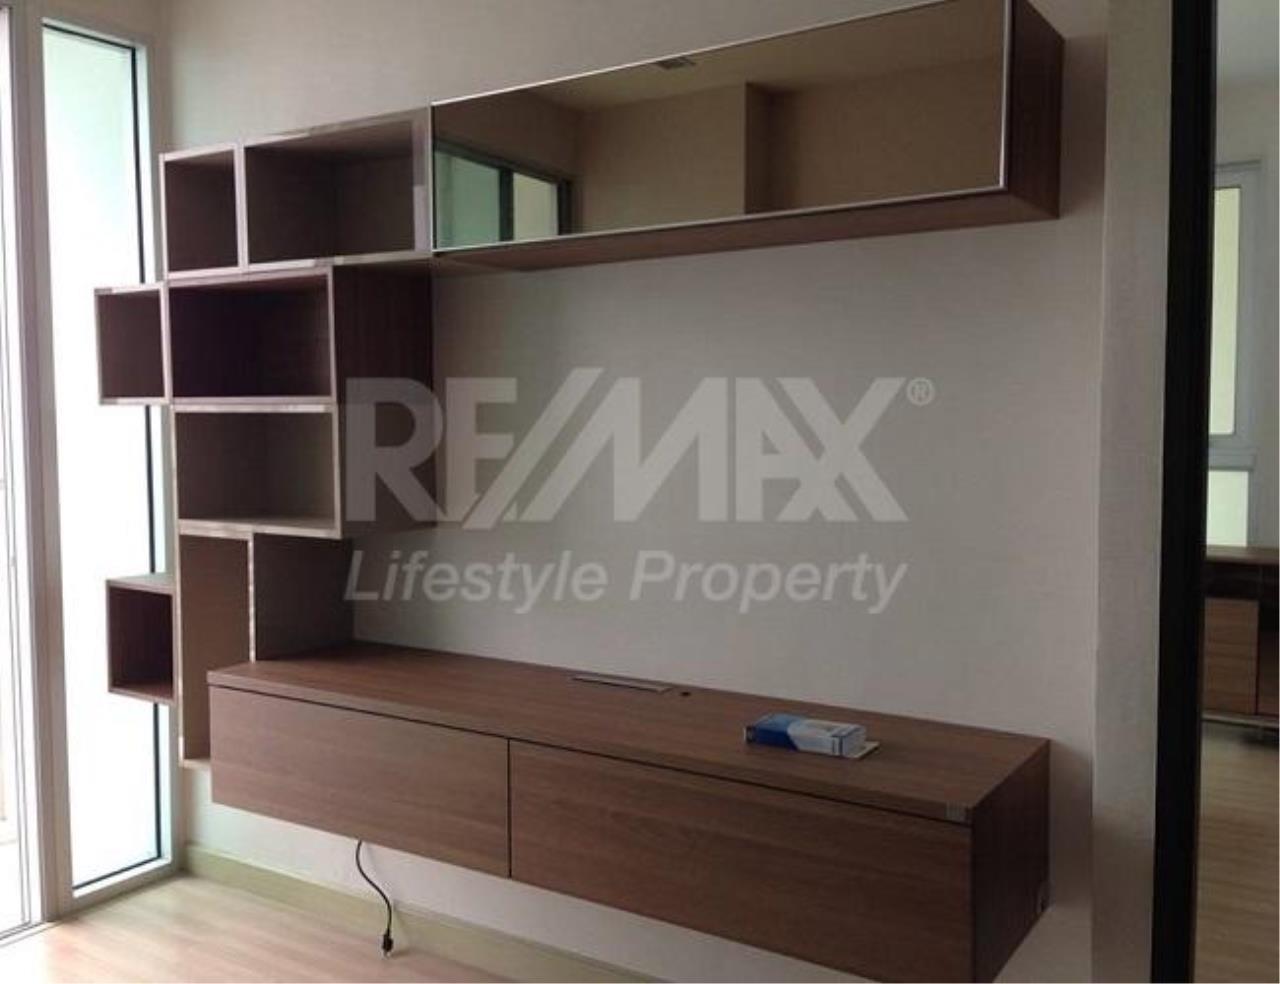 RE/MAX LifeStyle Property Agency's Sky Walk Condominium 12